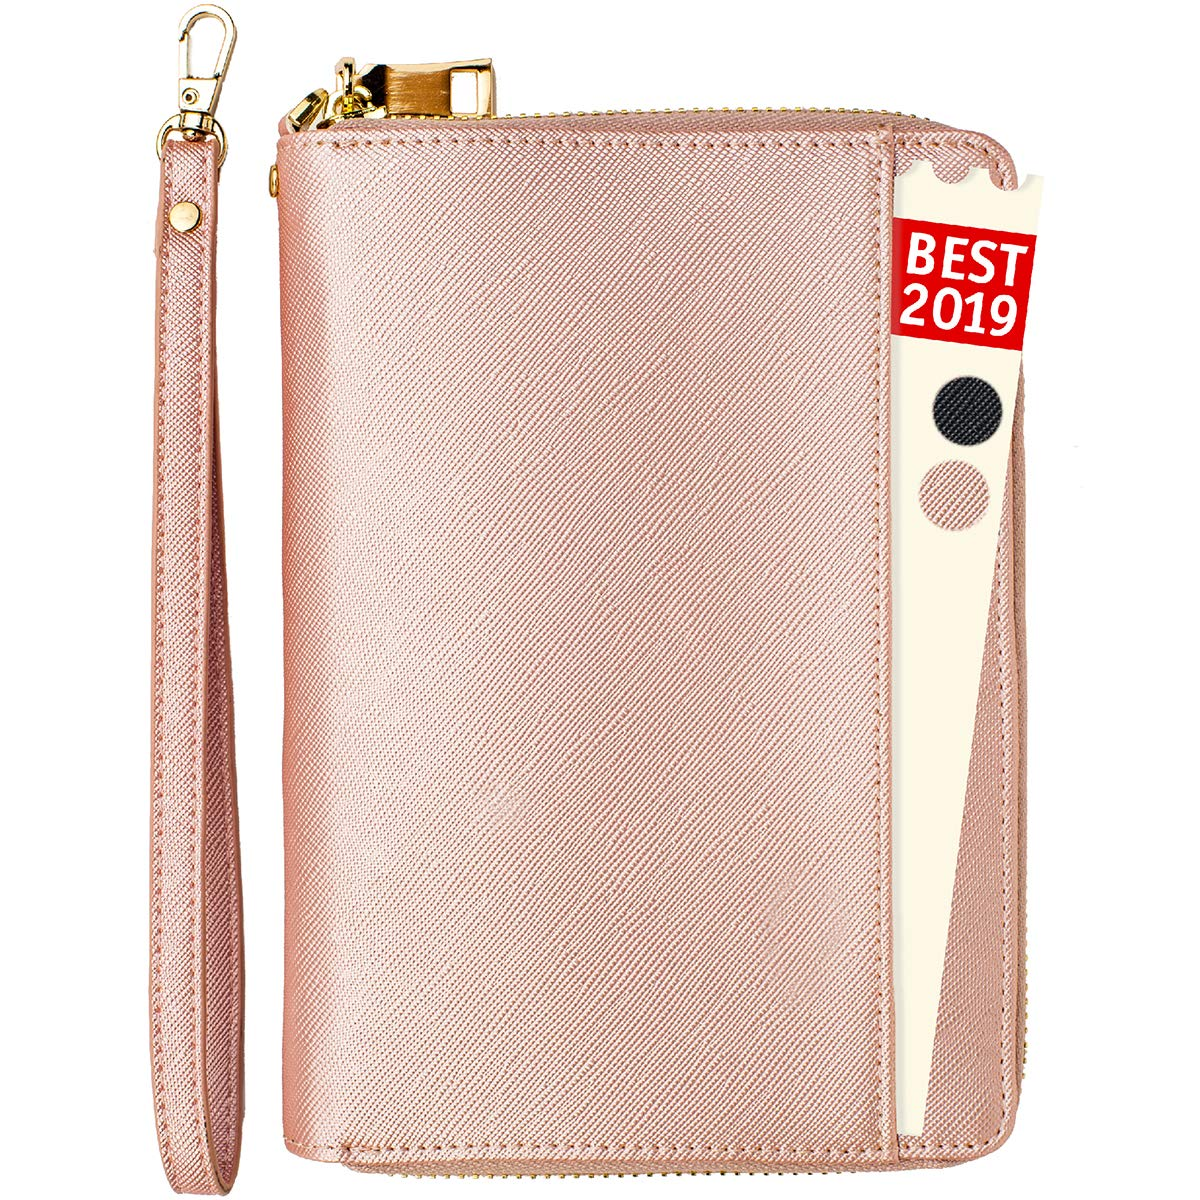 Travel Document Organizer - RFID Passport Wallet Case Family Travel Wallet Holder Id Wristlet (Rose Gold) by Apadi